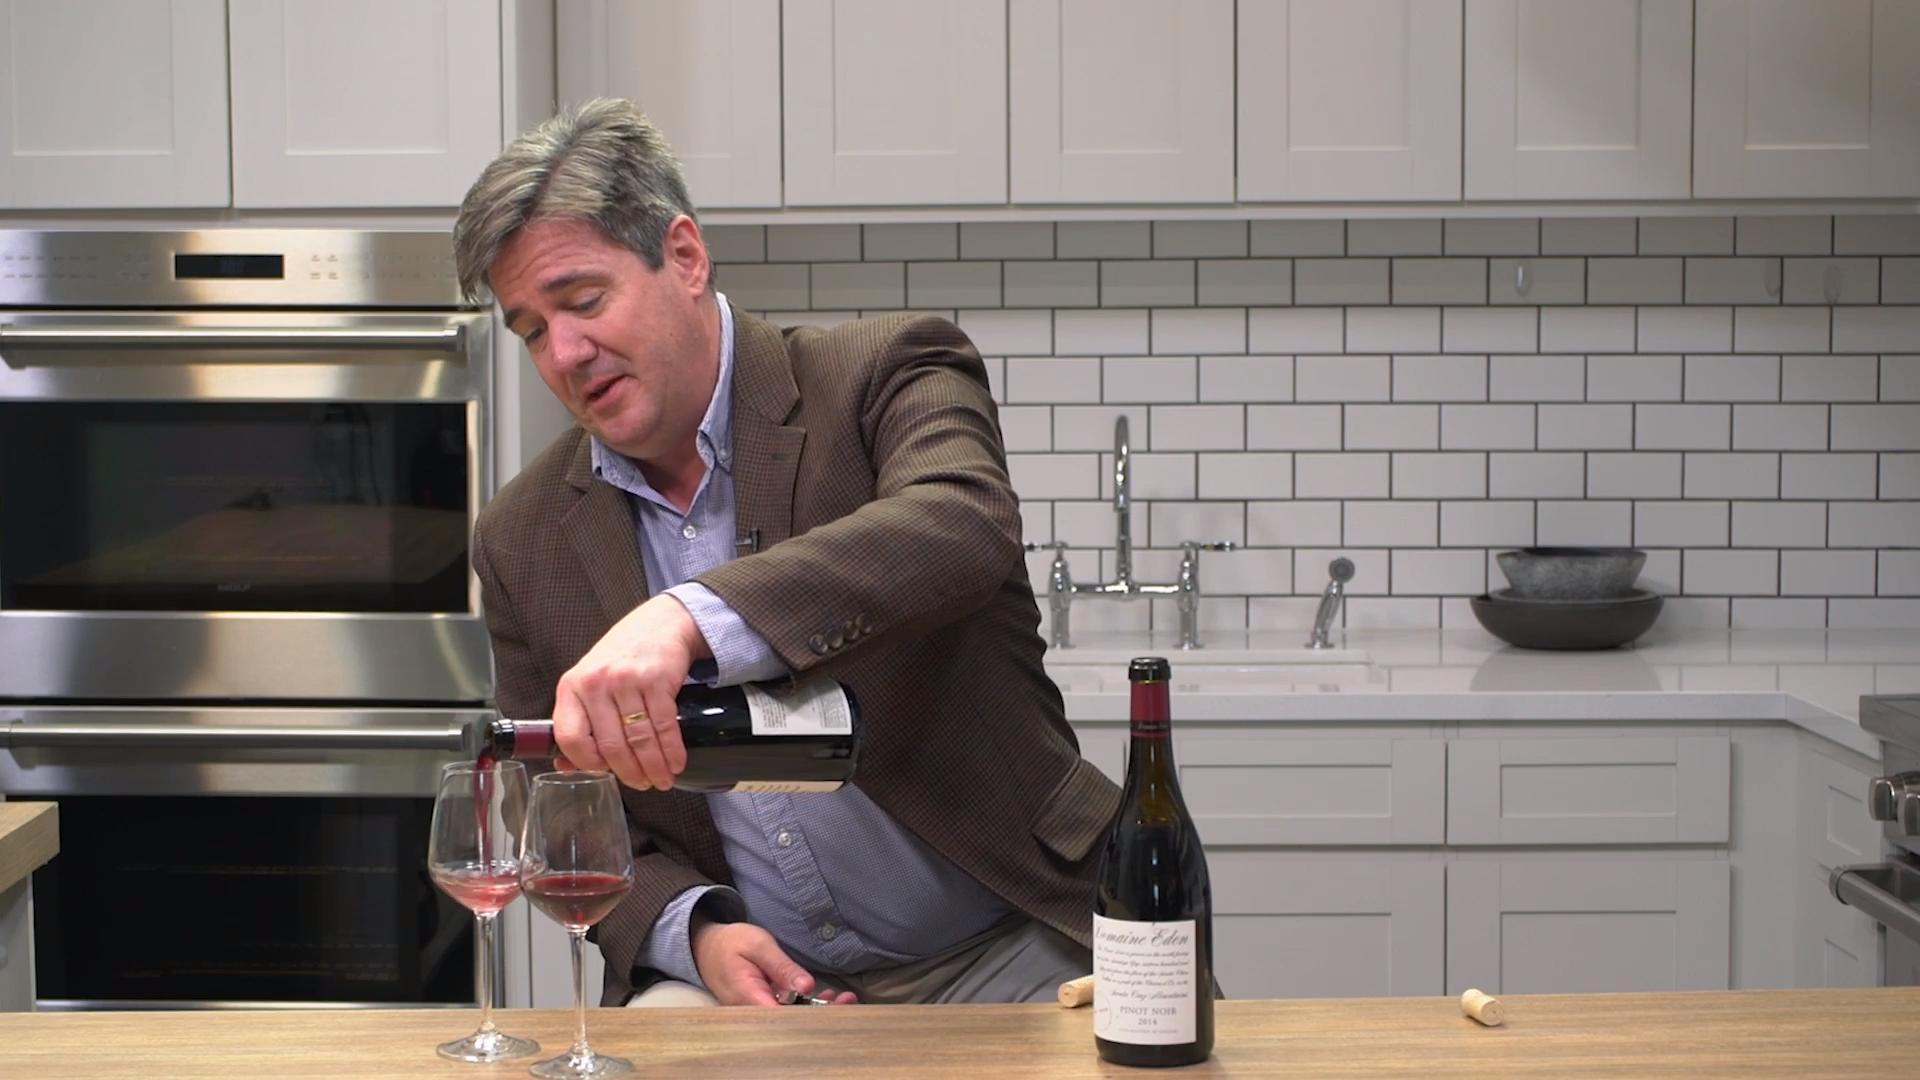 We Taste Test Prince Harry and Meghan Markle's $40 Royal Wedding Pinot Noir